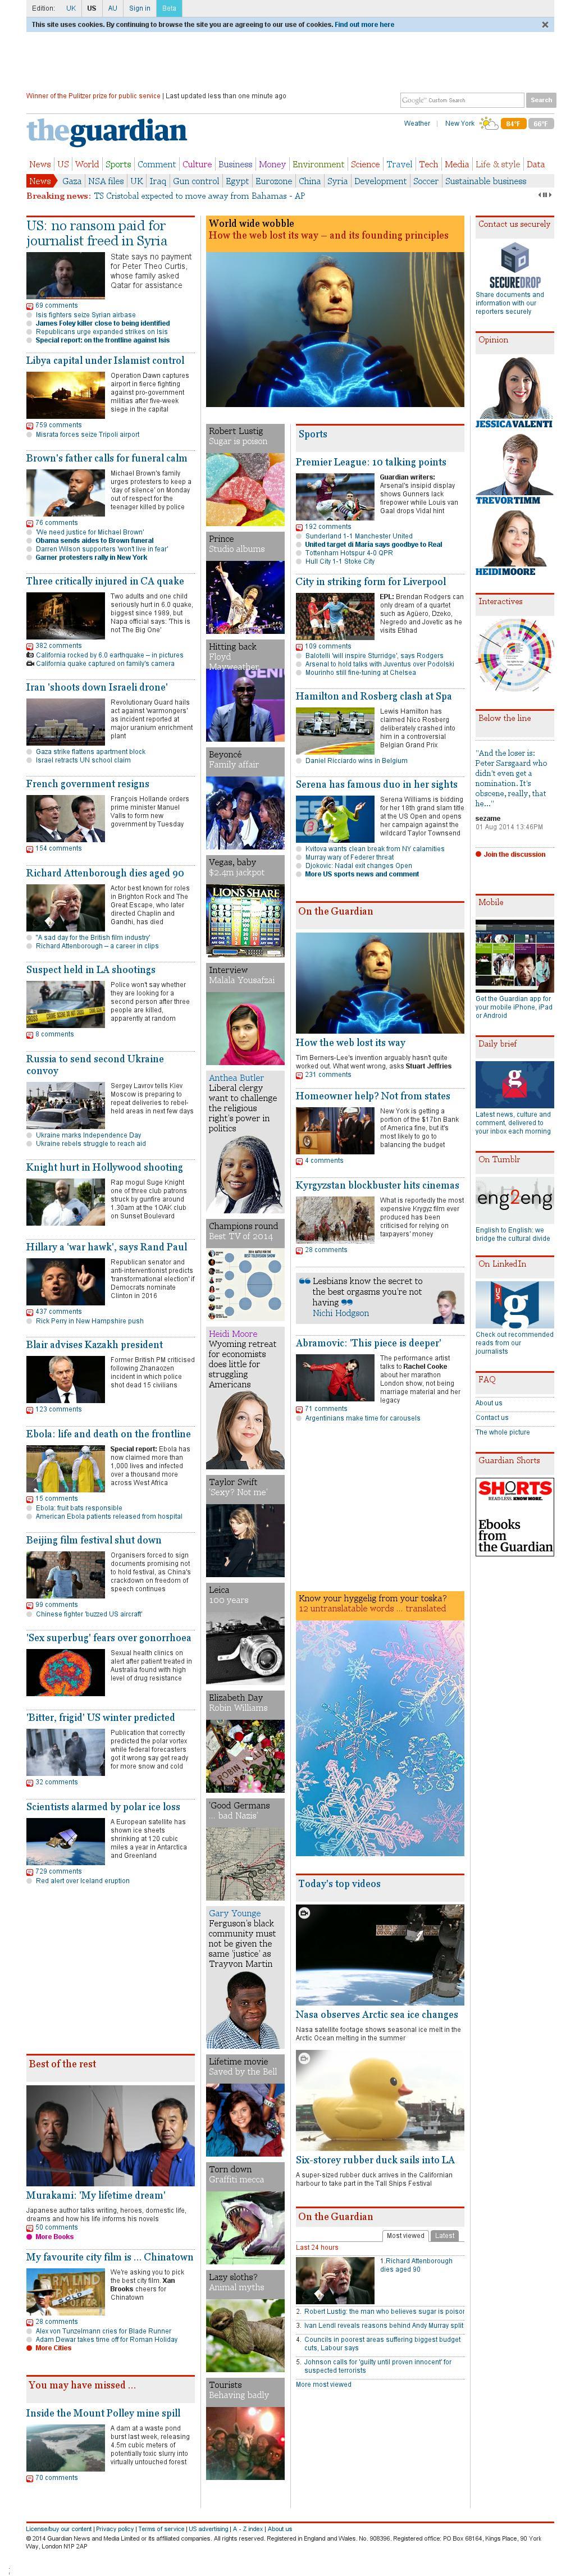 The Guardian at Monday Aug. 25, 2014, 10:09 a.m. UTC